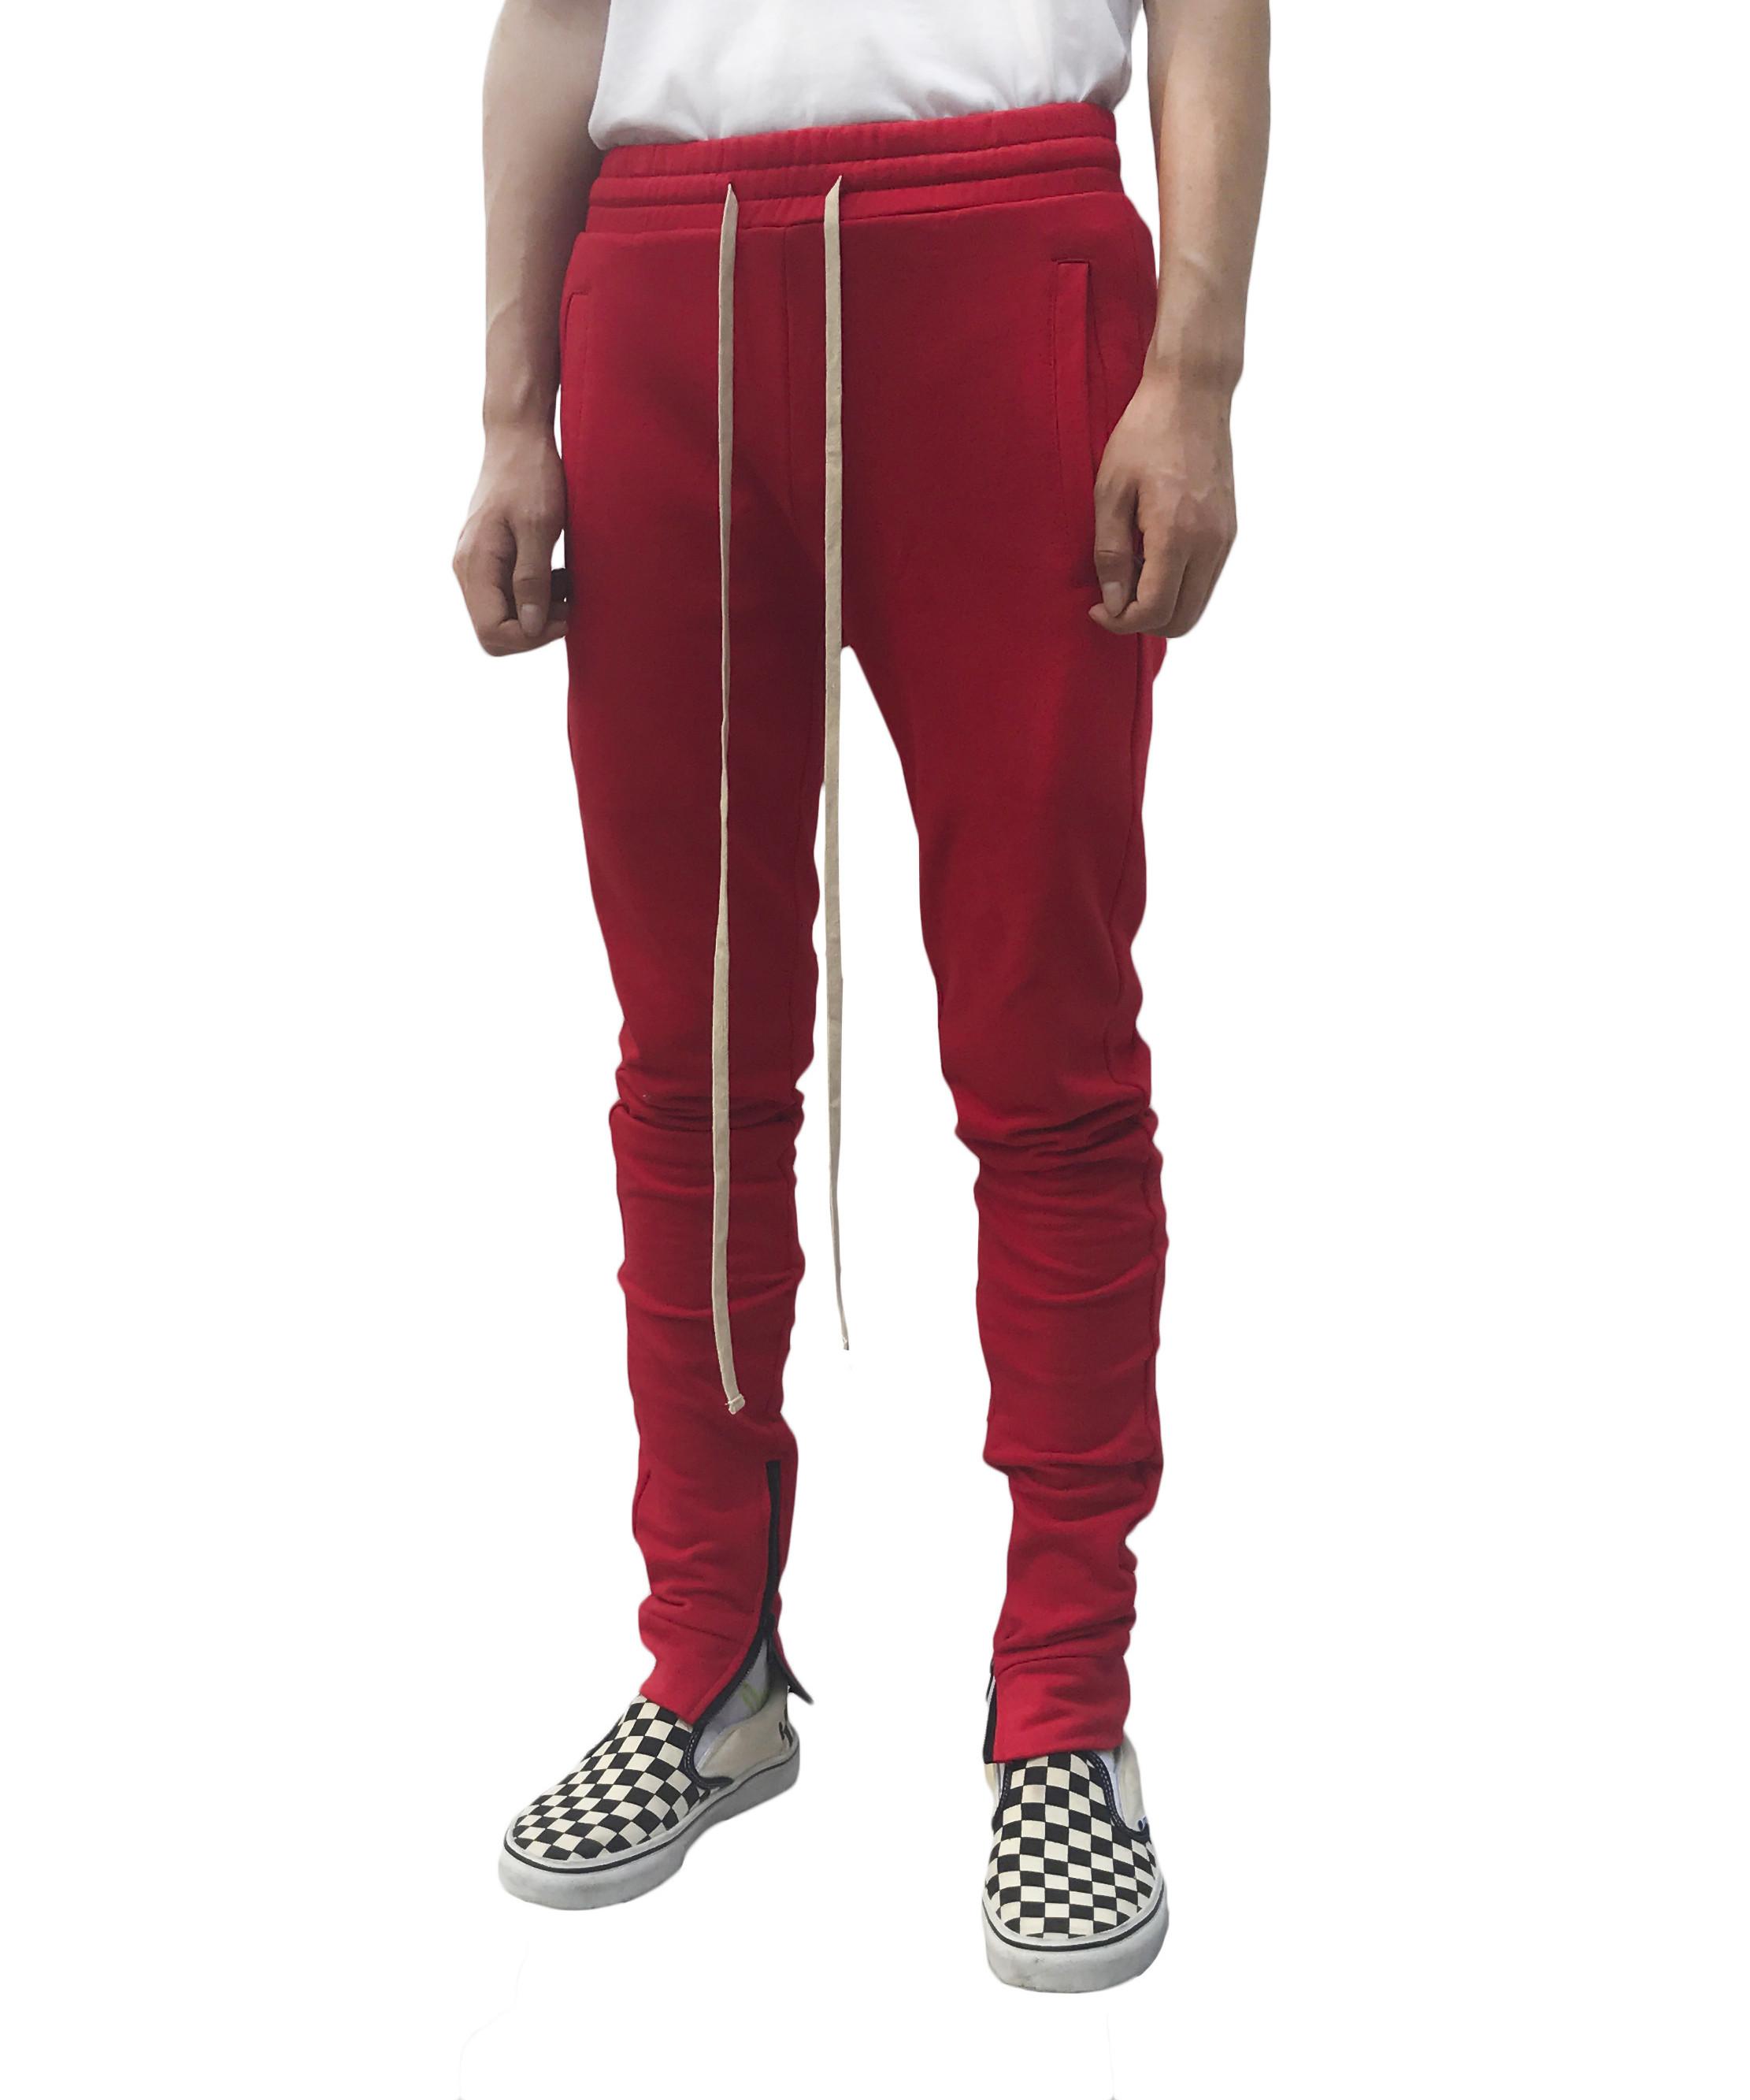 Zip Everyday Sweatpants - Red